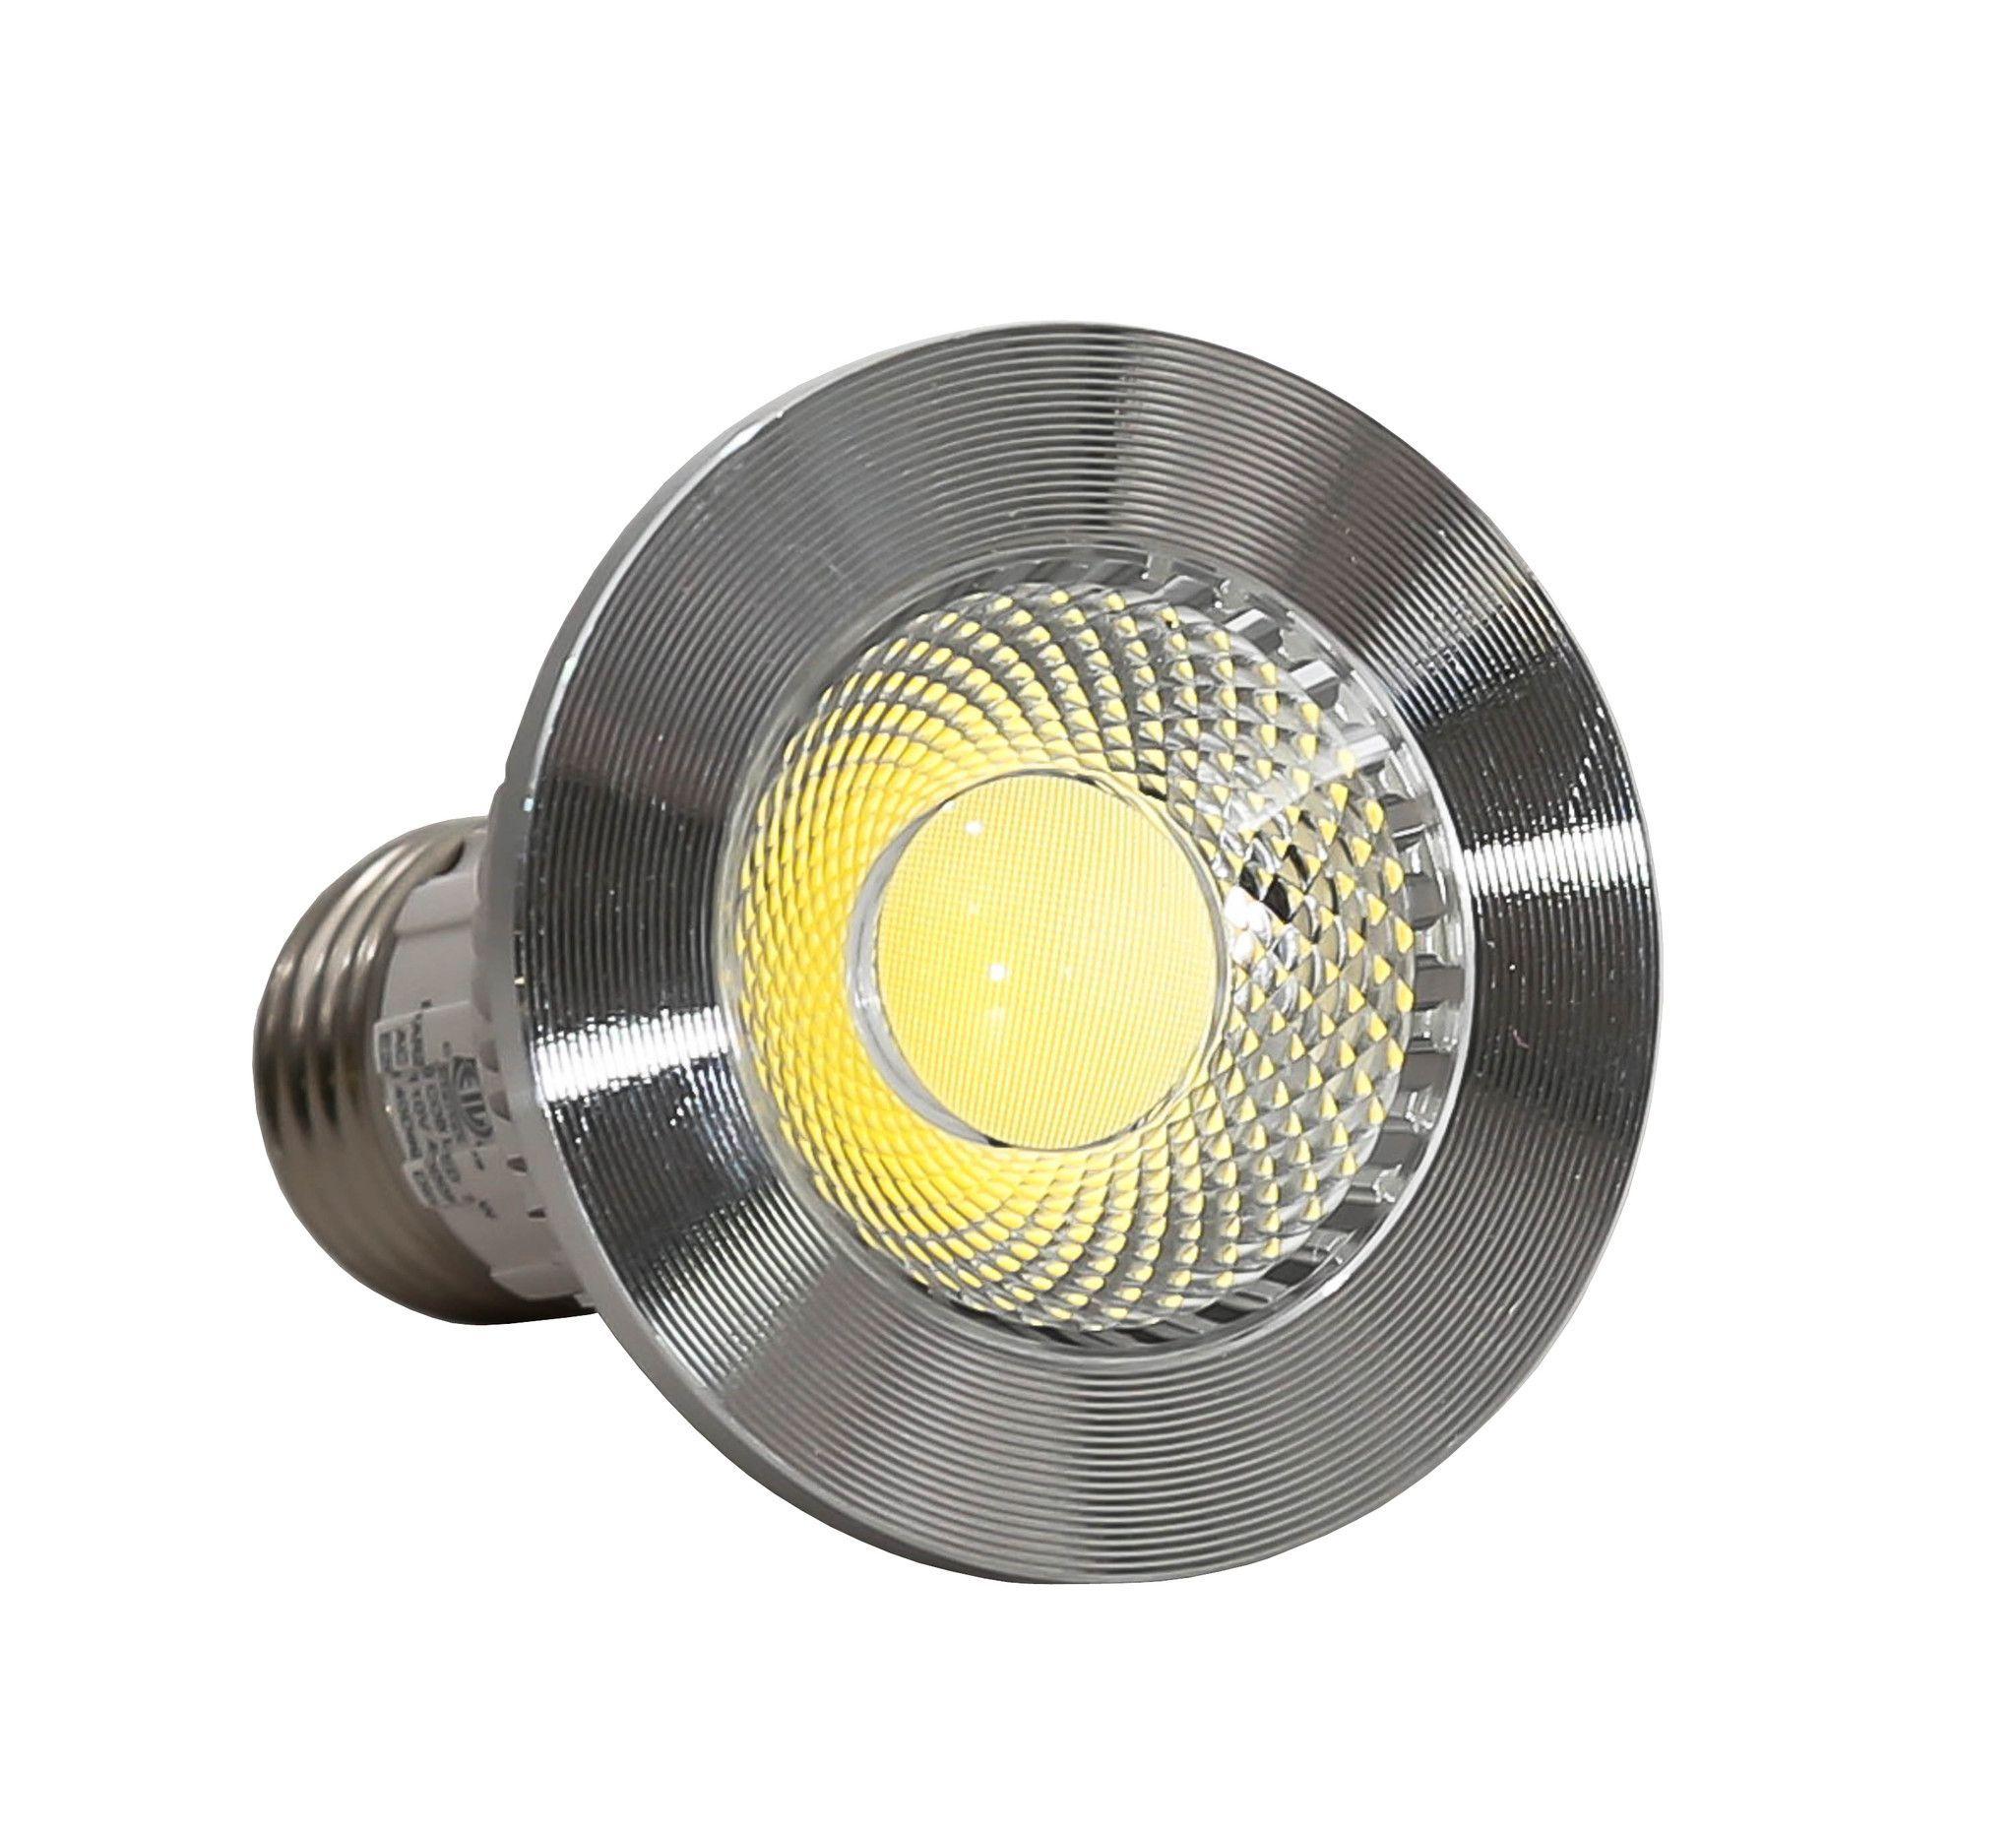 ac3c9e01d92a0368b856a716c72a3288 Stilvolle Led Lampen 20 Watt Dekorationen